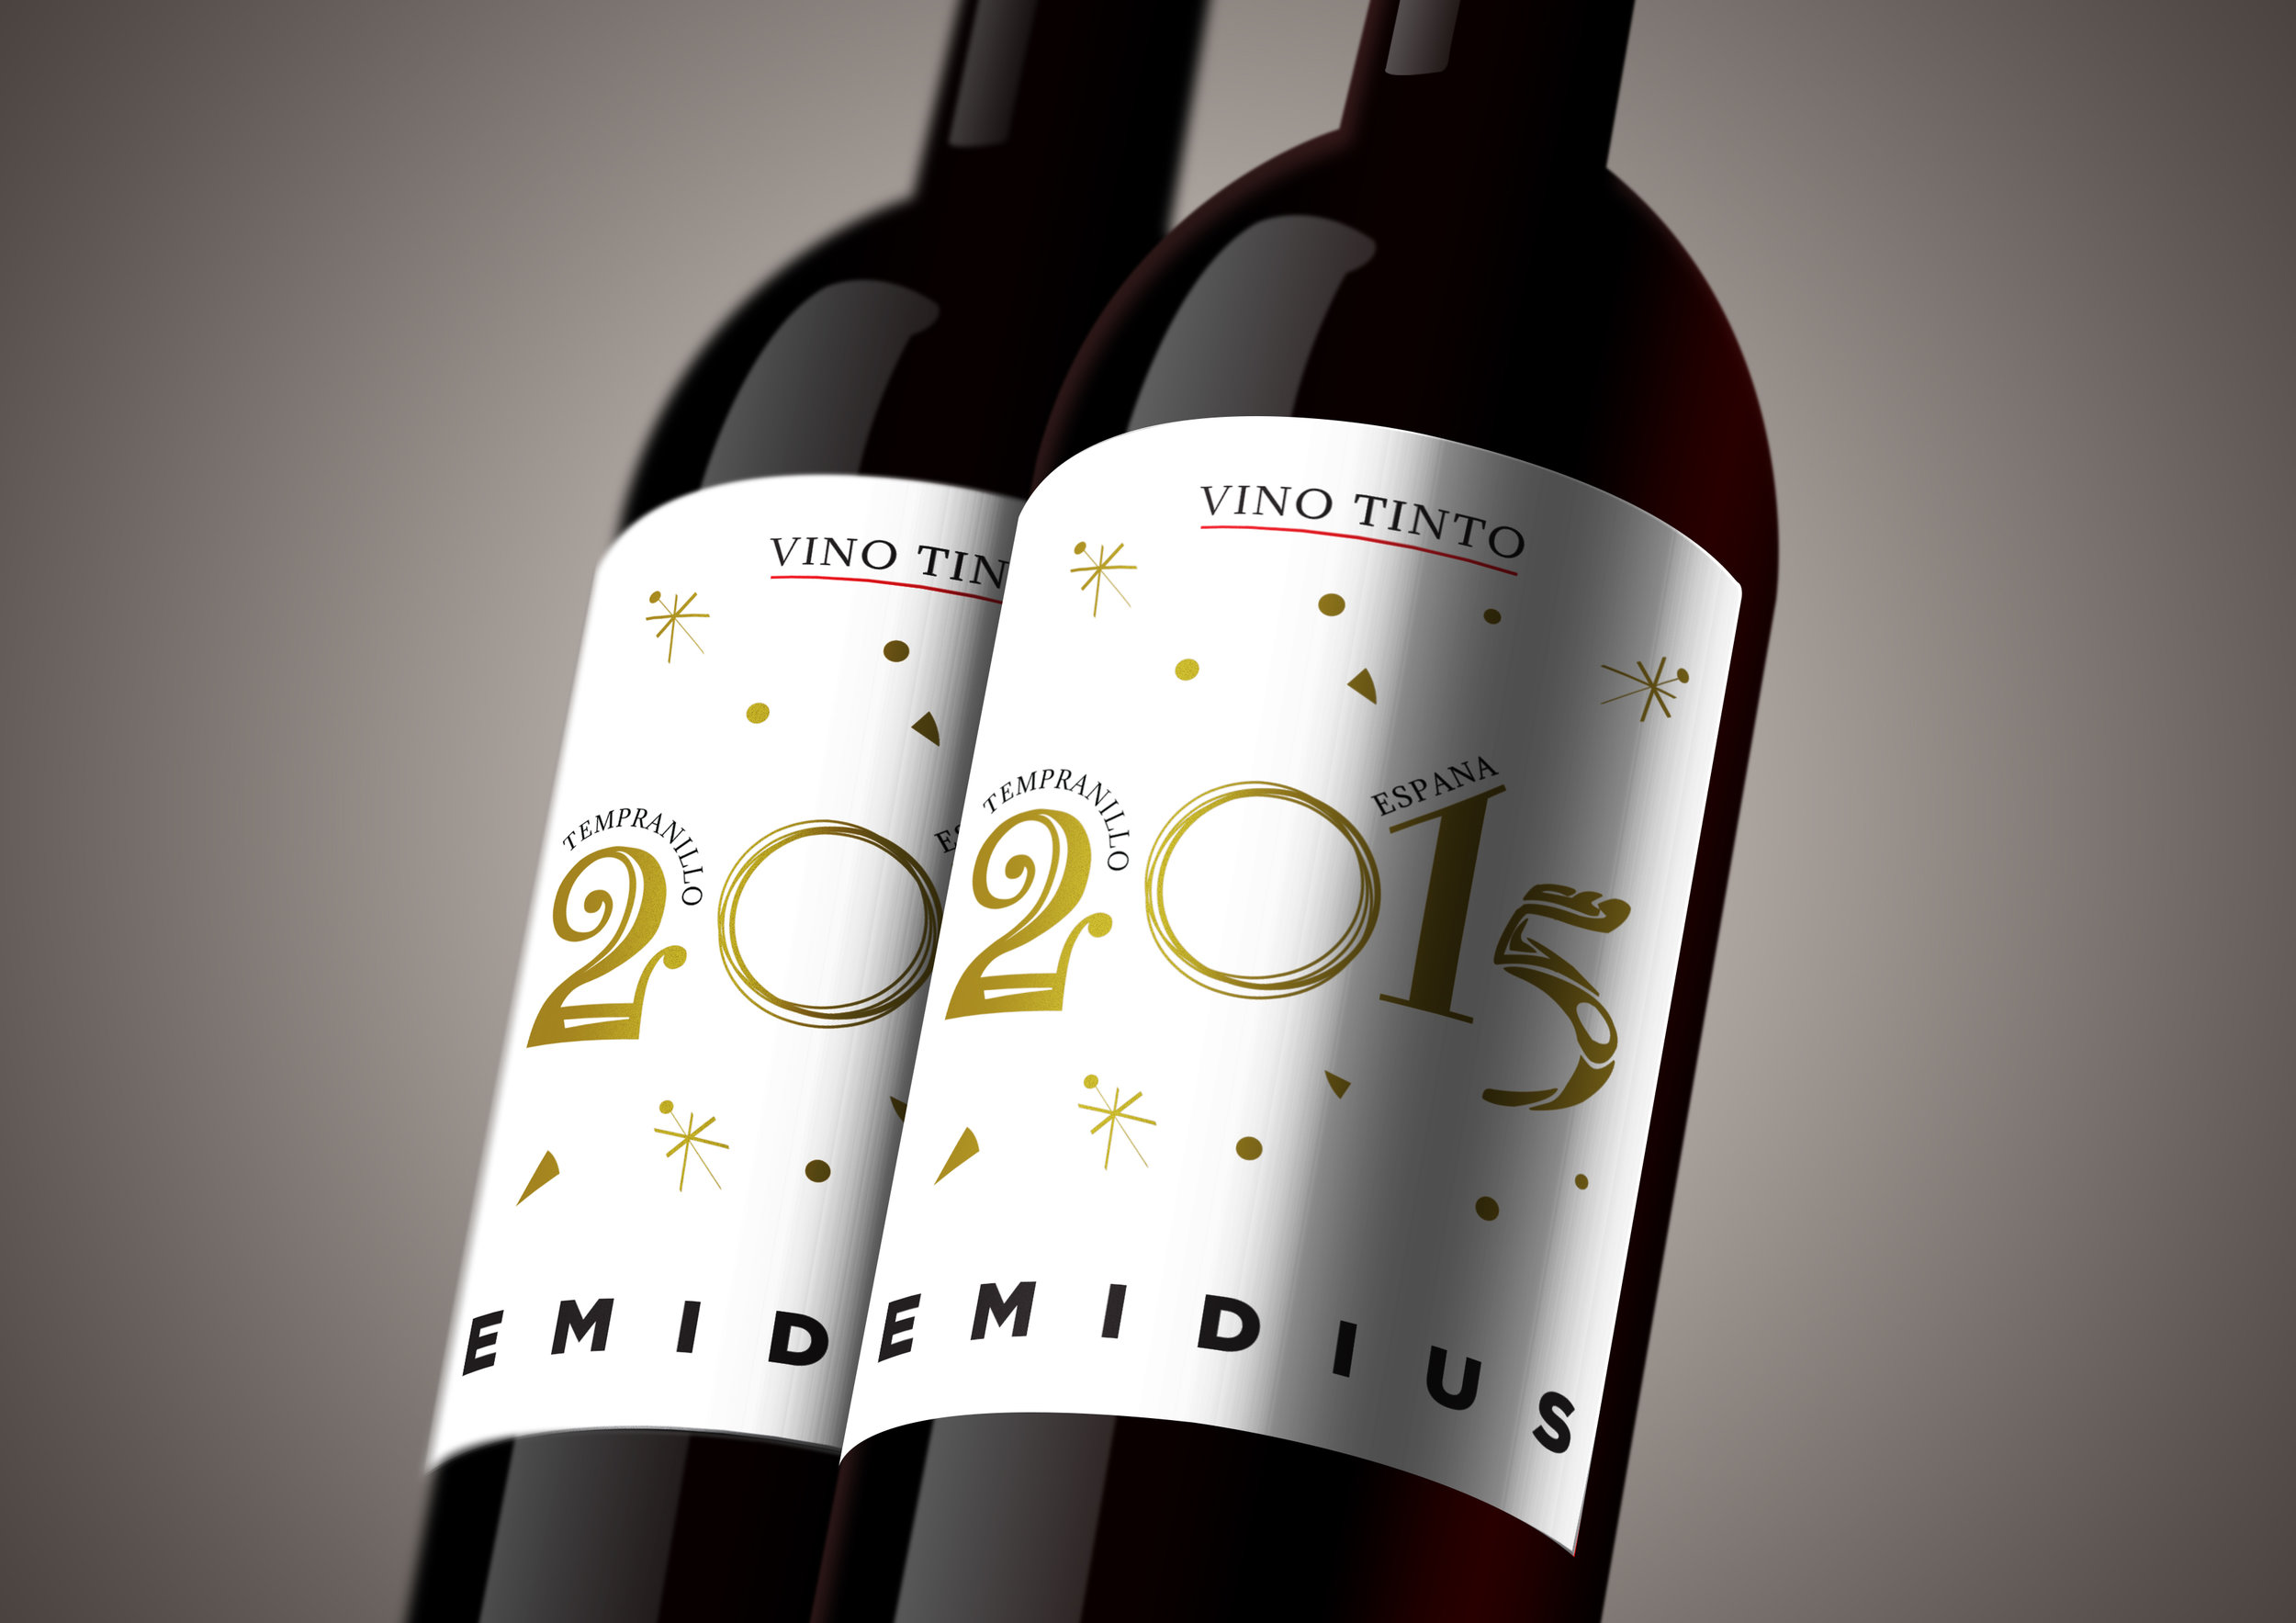 Emidius 2 Bottle Shot.jpg